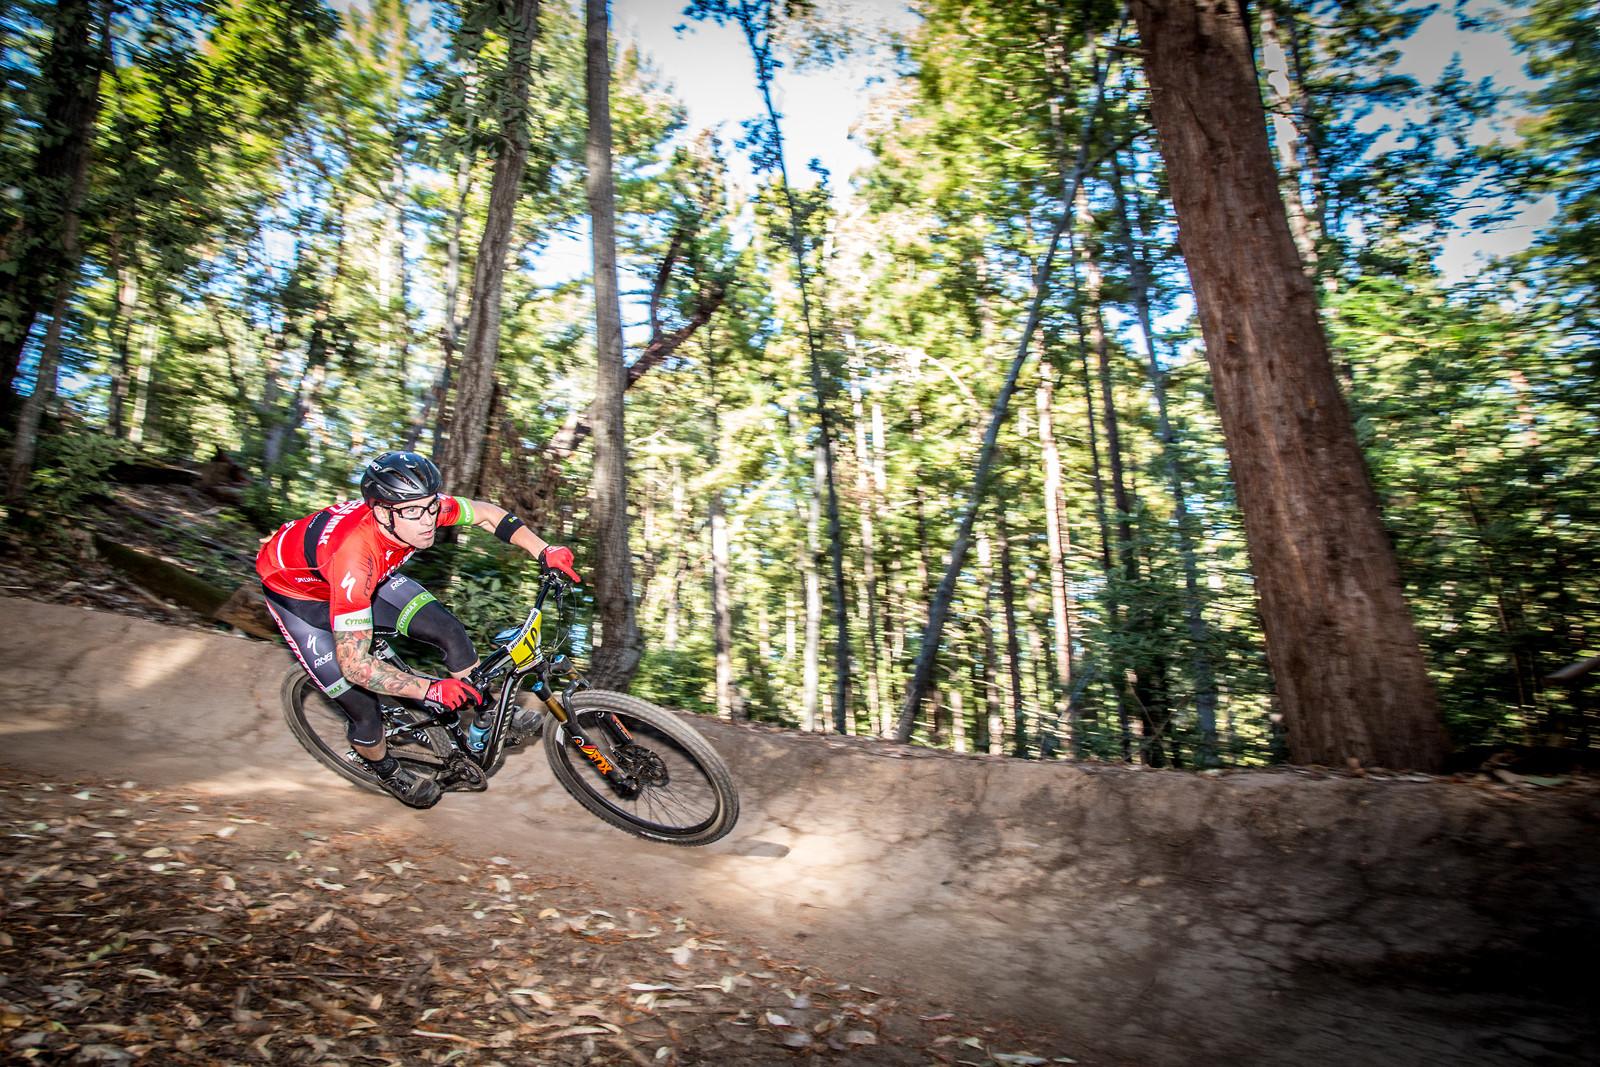 California Enduro Series Round 5 (Finale): Bell Santa Cruz Super Enduro - calienduro - Mountain Biking Pictures - Vital MTB